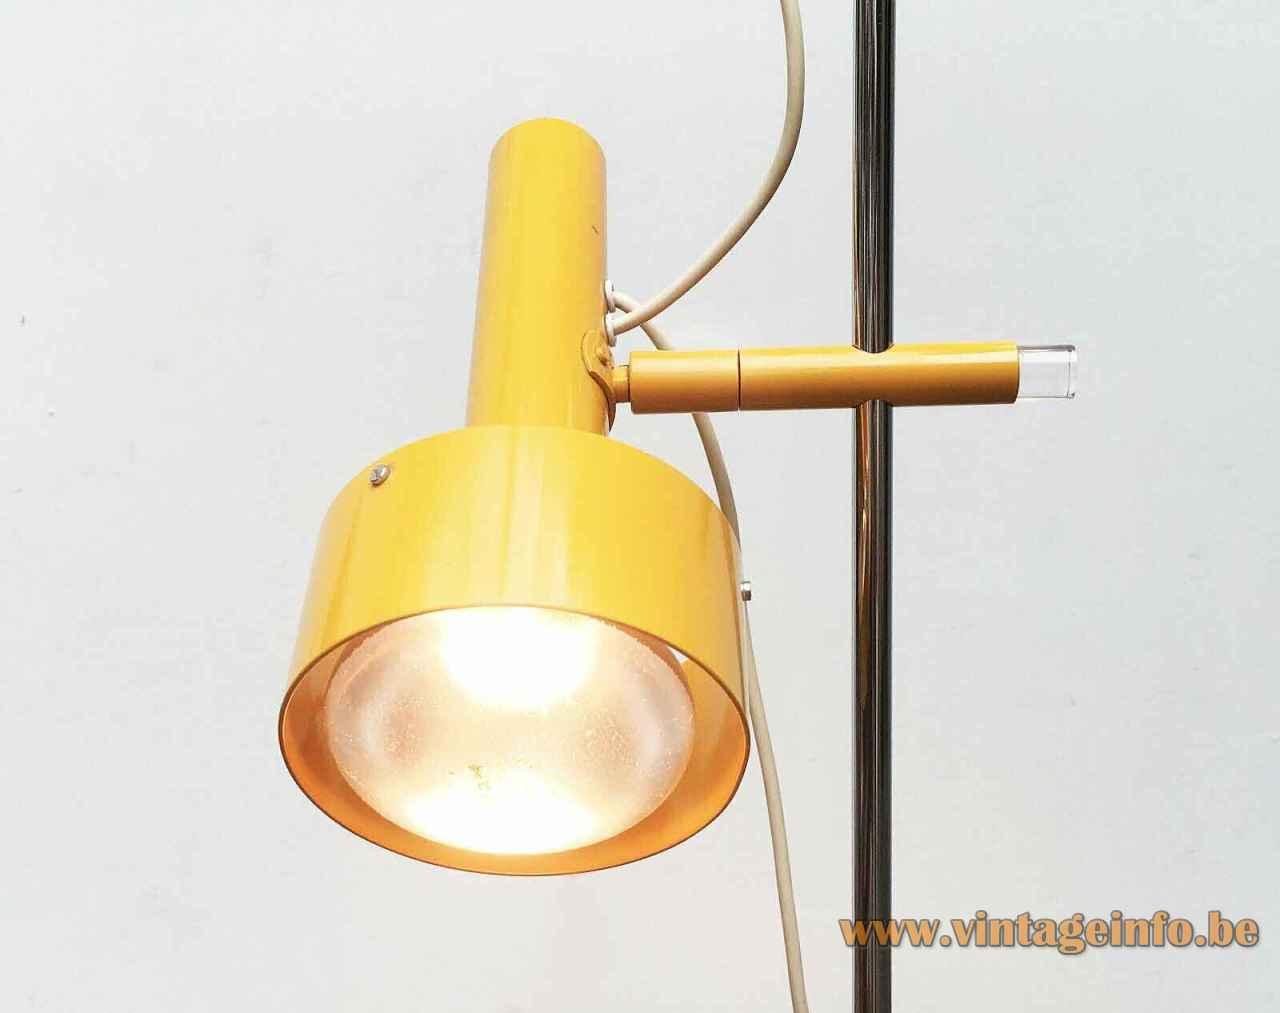 Edi Franz Swisslamps floor lamp adjustable round elongated yellow lampshades chrom rod 1950s 1960s Switzerland